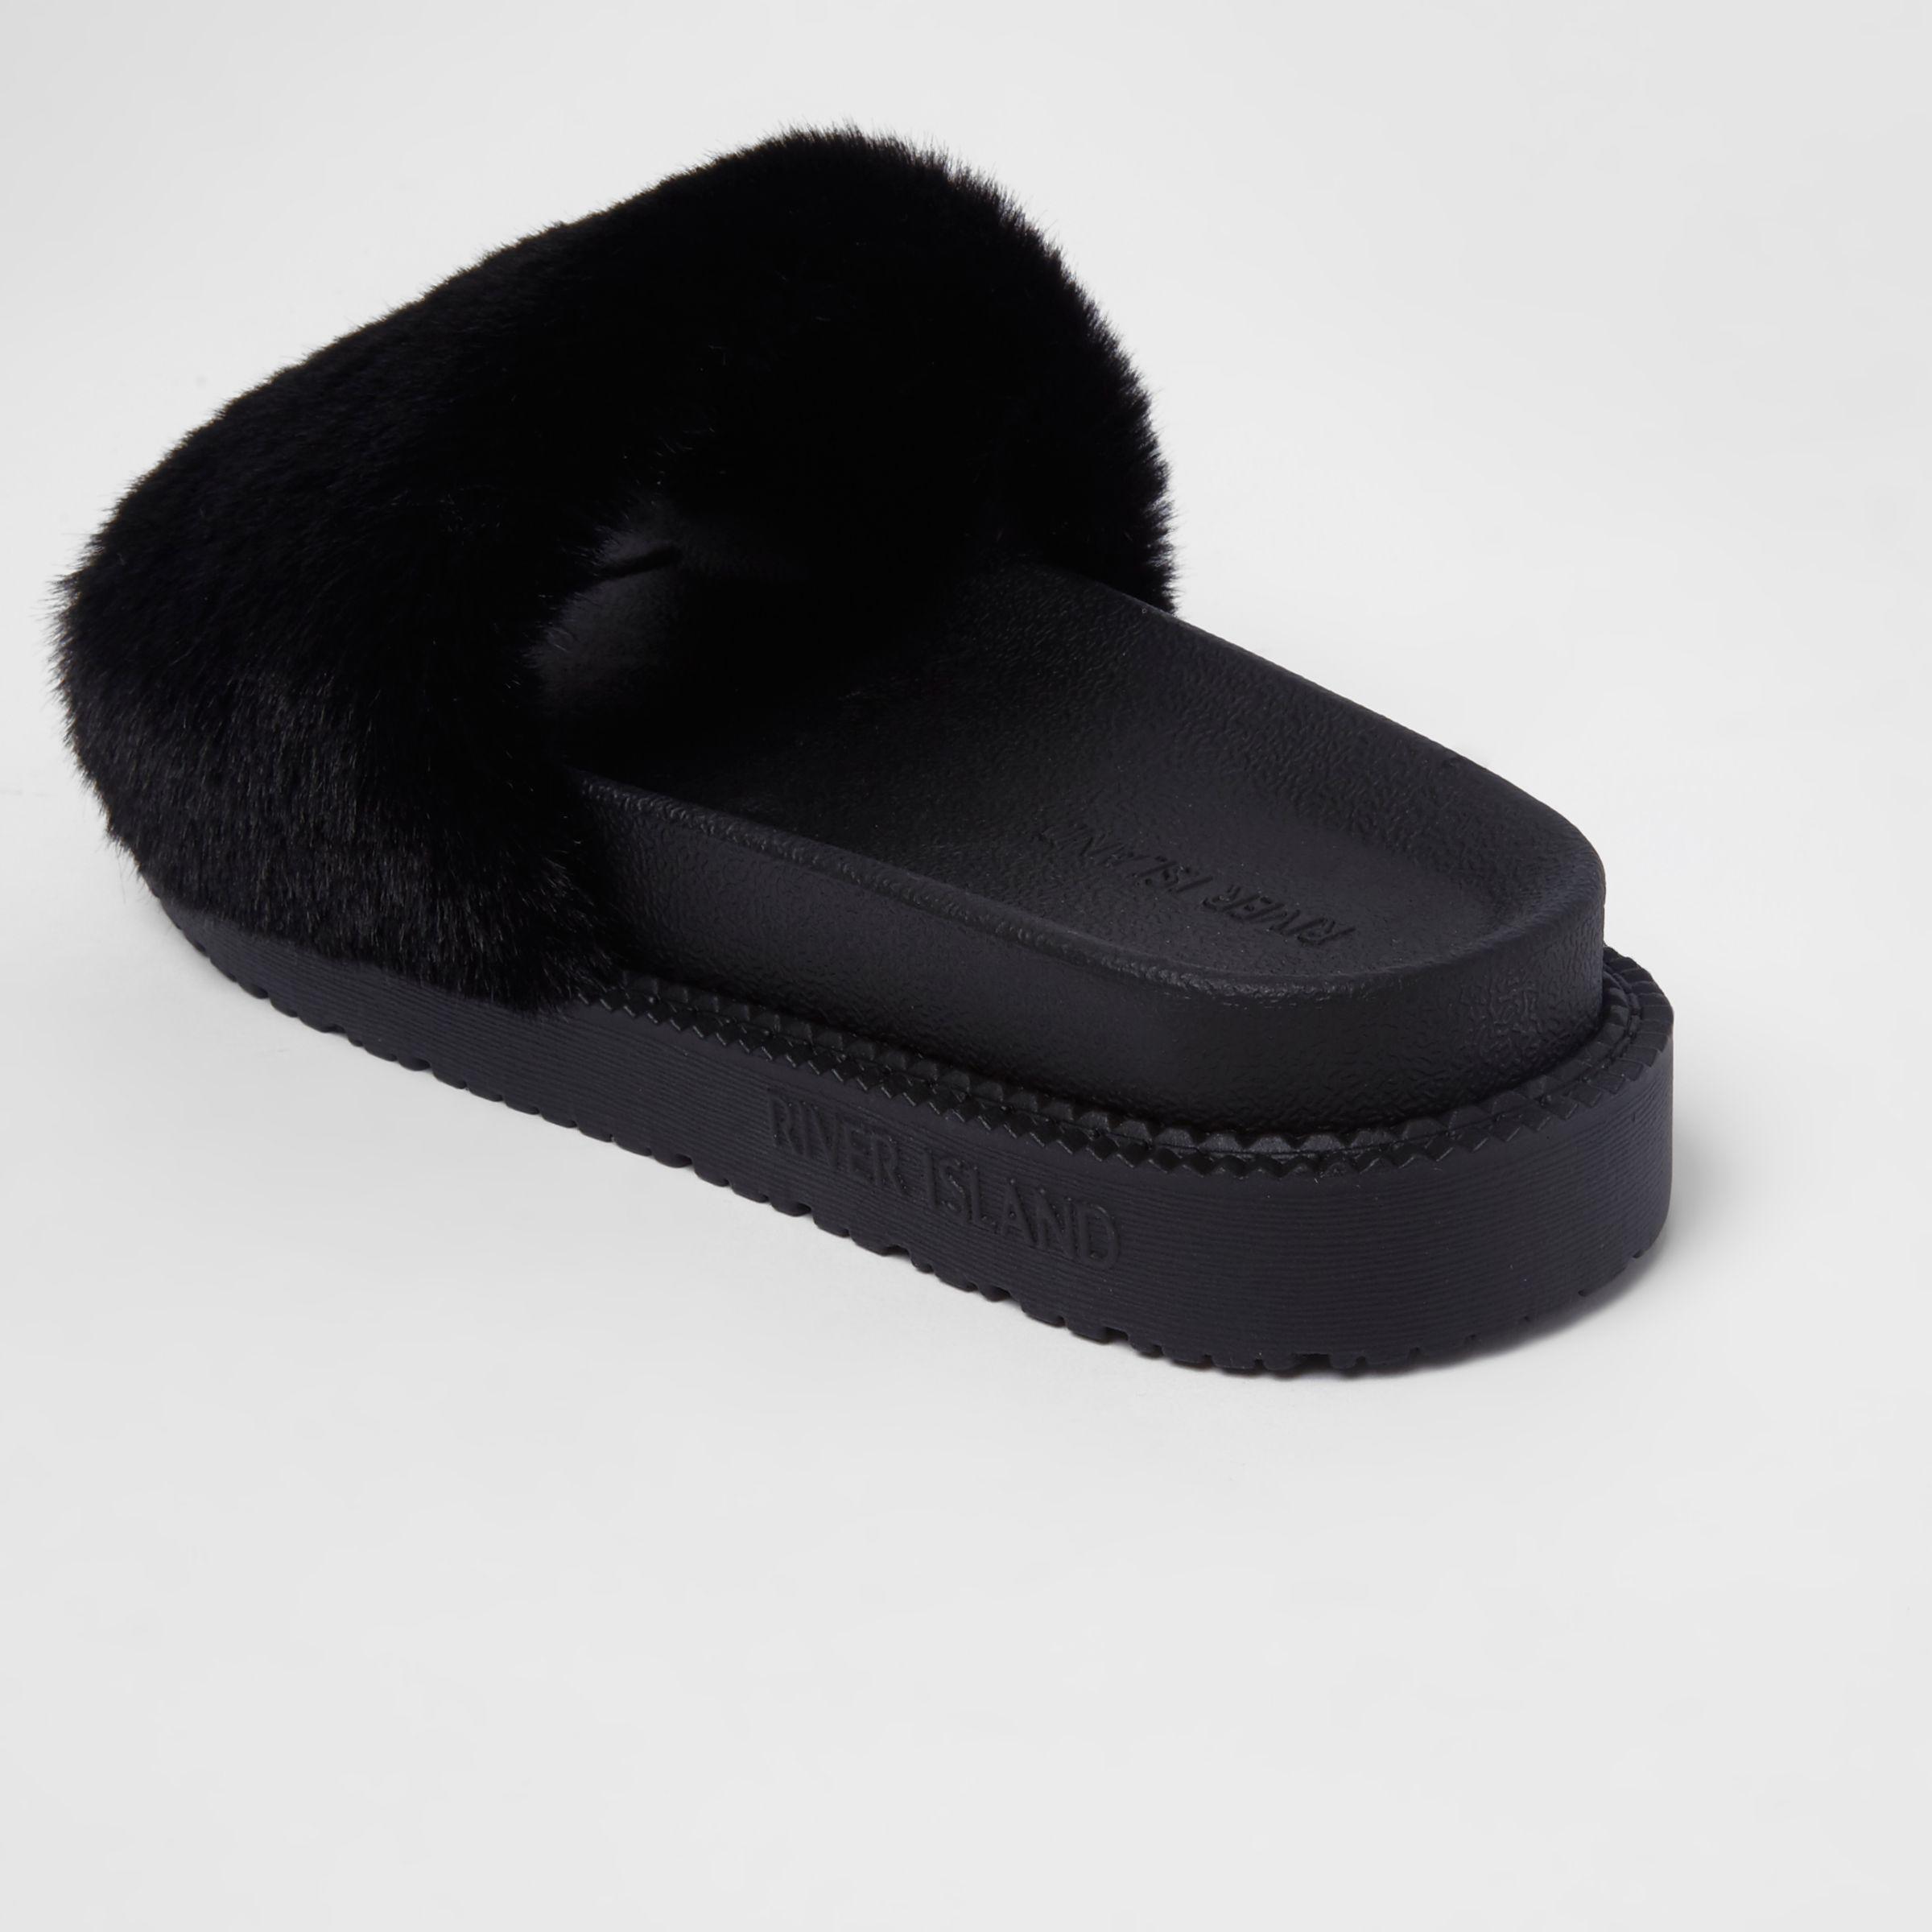 ab4b65f40912 Lyst - River Island Black Faux Fur Sliders in Black